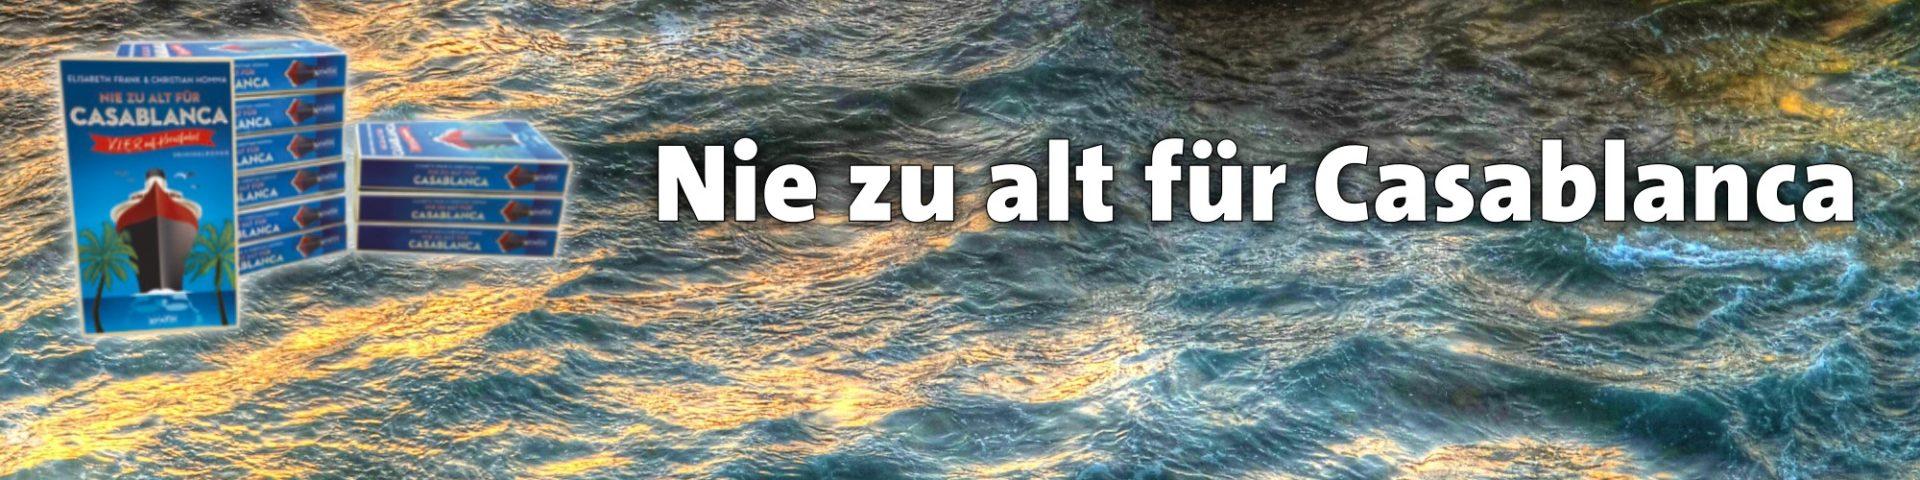 kreuzfahrt-krimi-vier-buch-christian-homma-elisabeth-frank-band-2